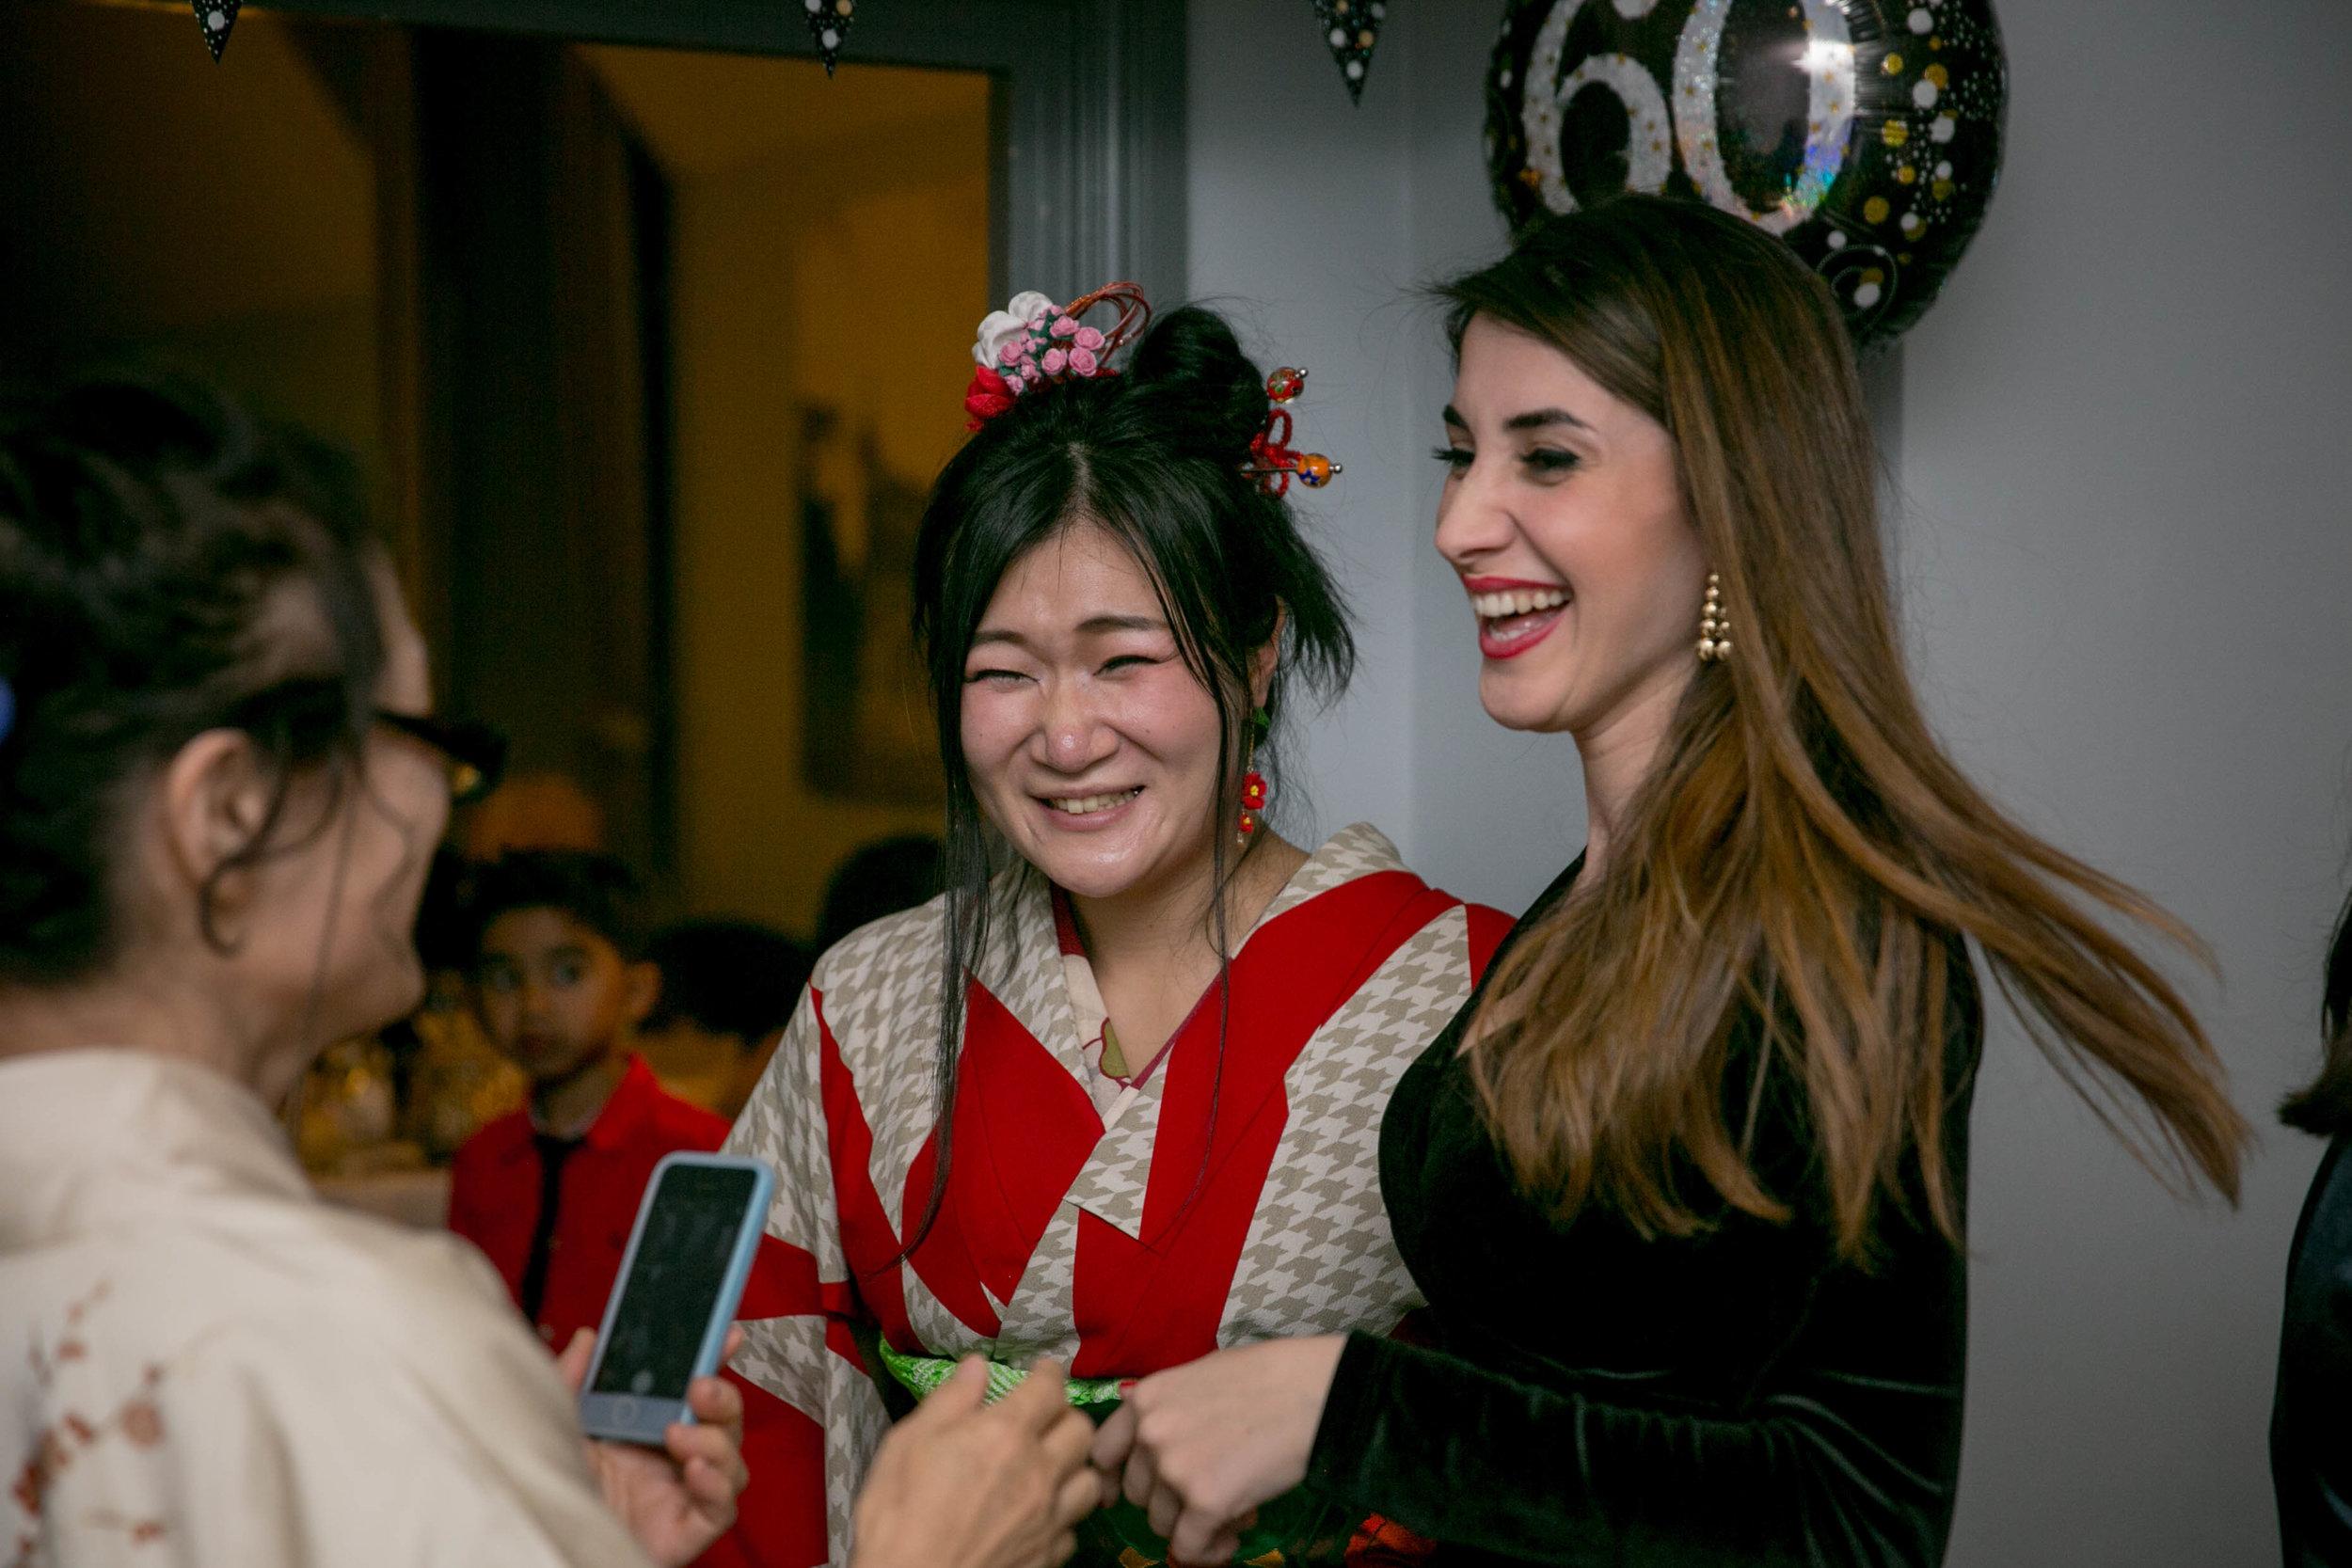 hilton-double-tree-cadbury-house-surprise-birthday-party-photography-natalia-smith-photography-18.jpg